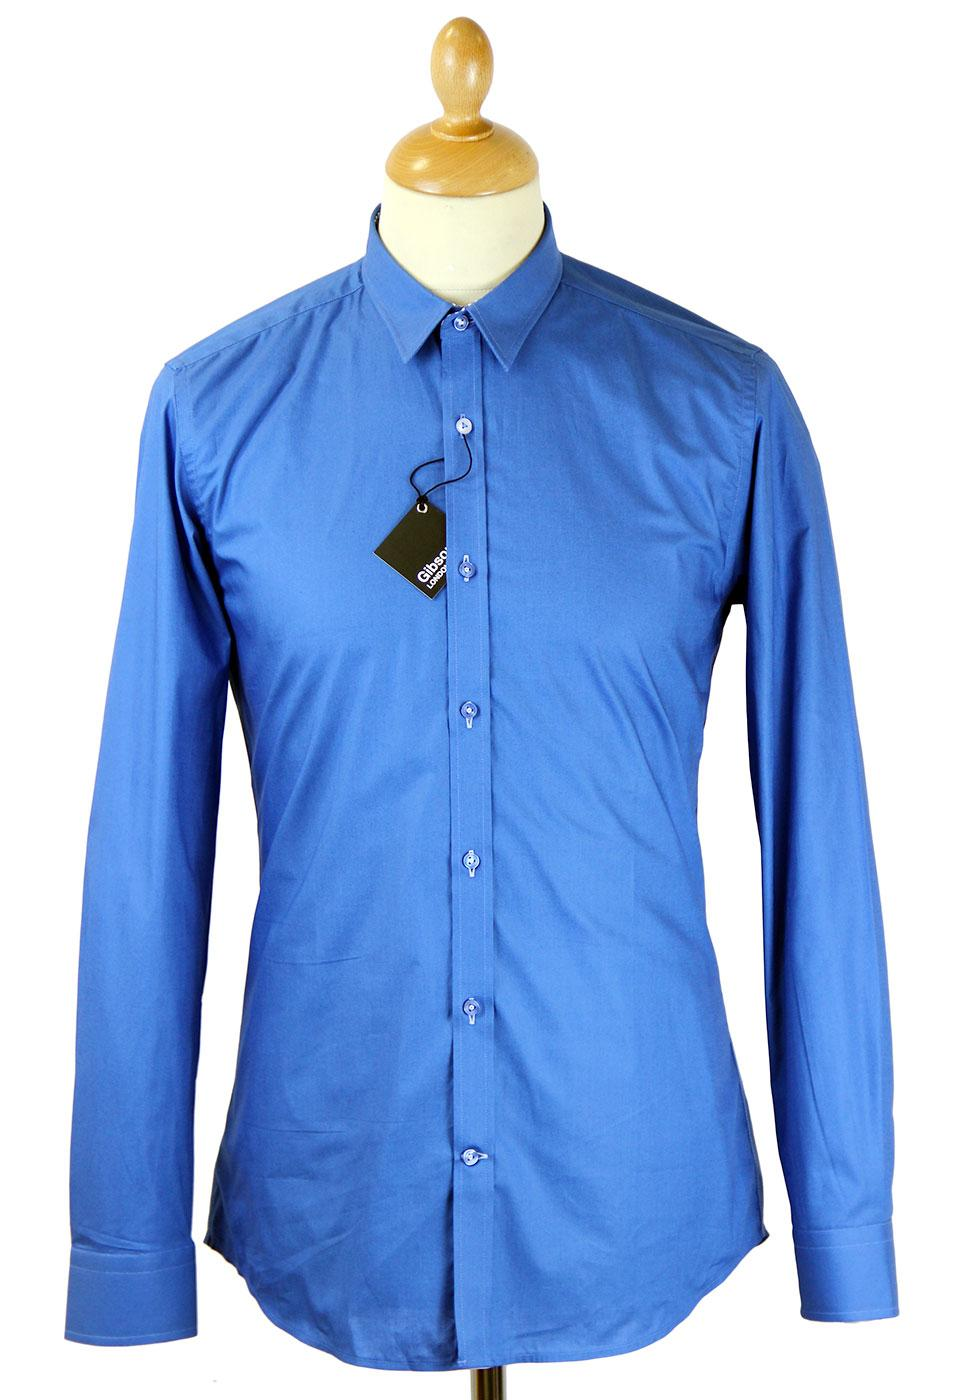 GIBSON LONDON Mod Point Collar Smart Poplin Shirt